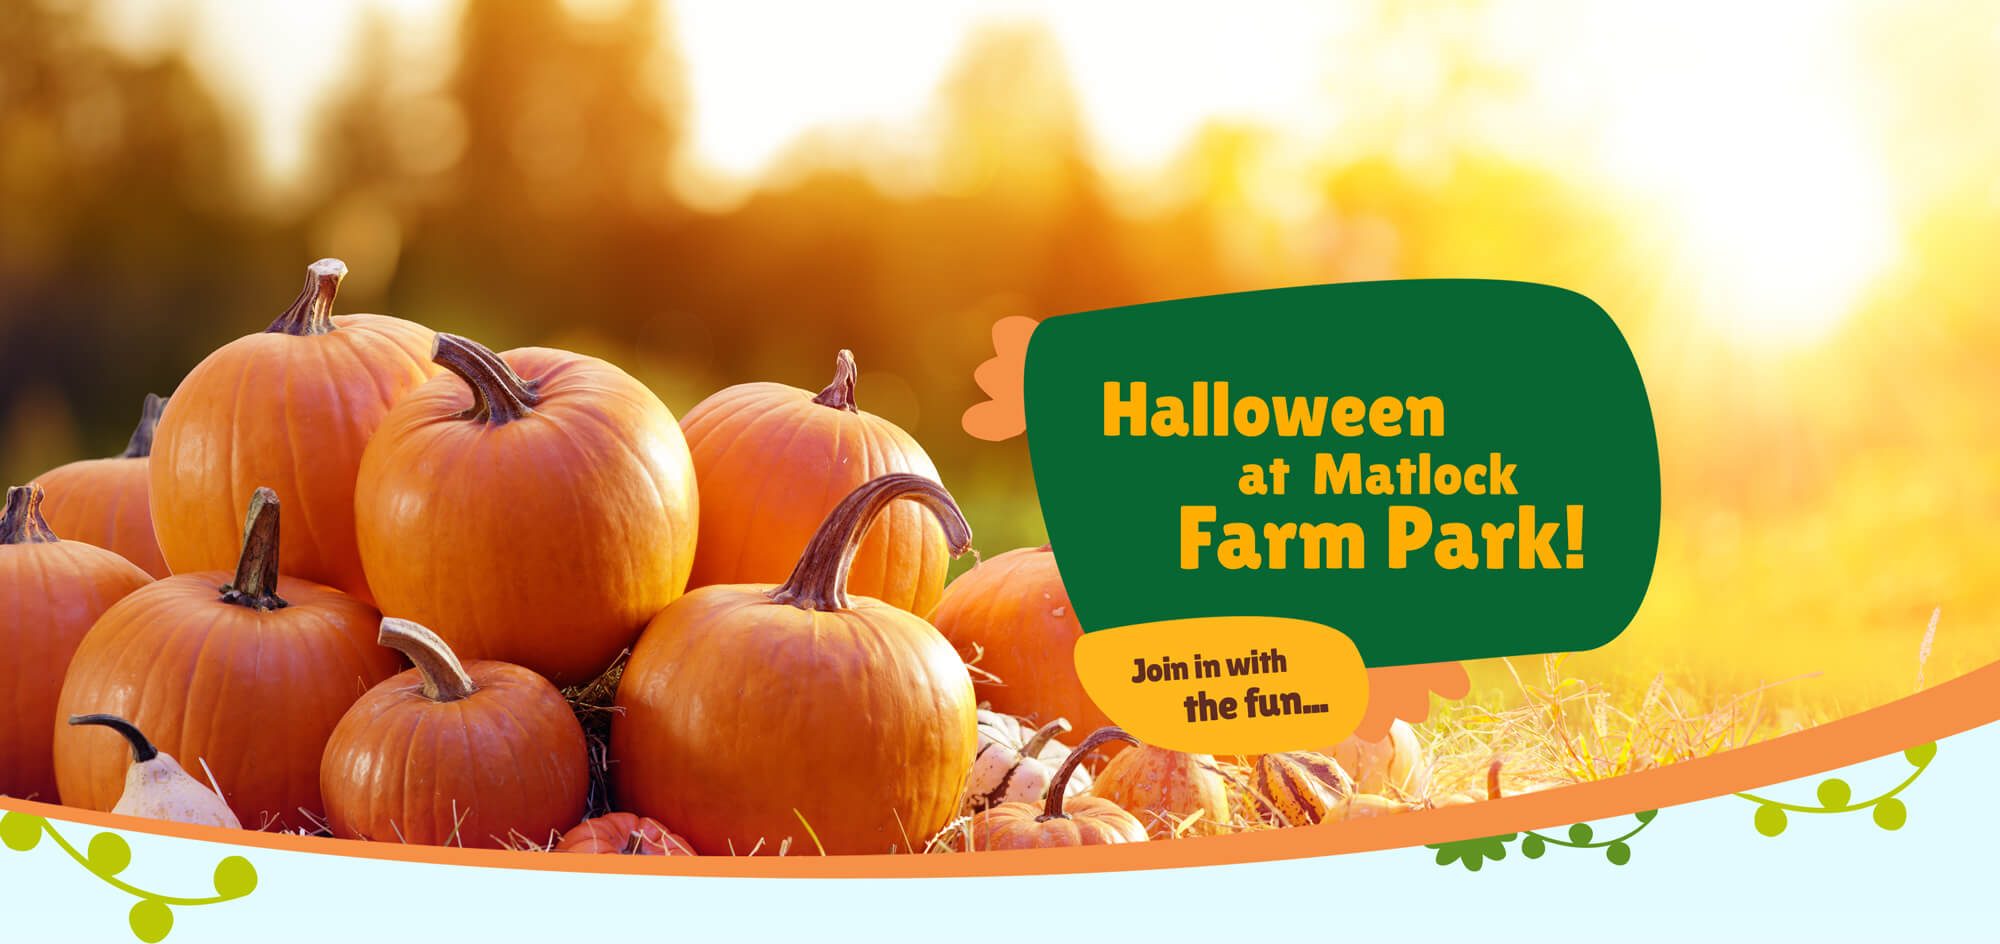 Be a friend of Matlock Farm Park